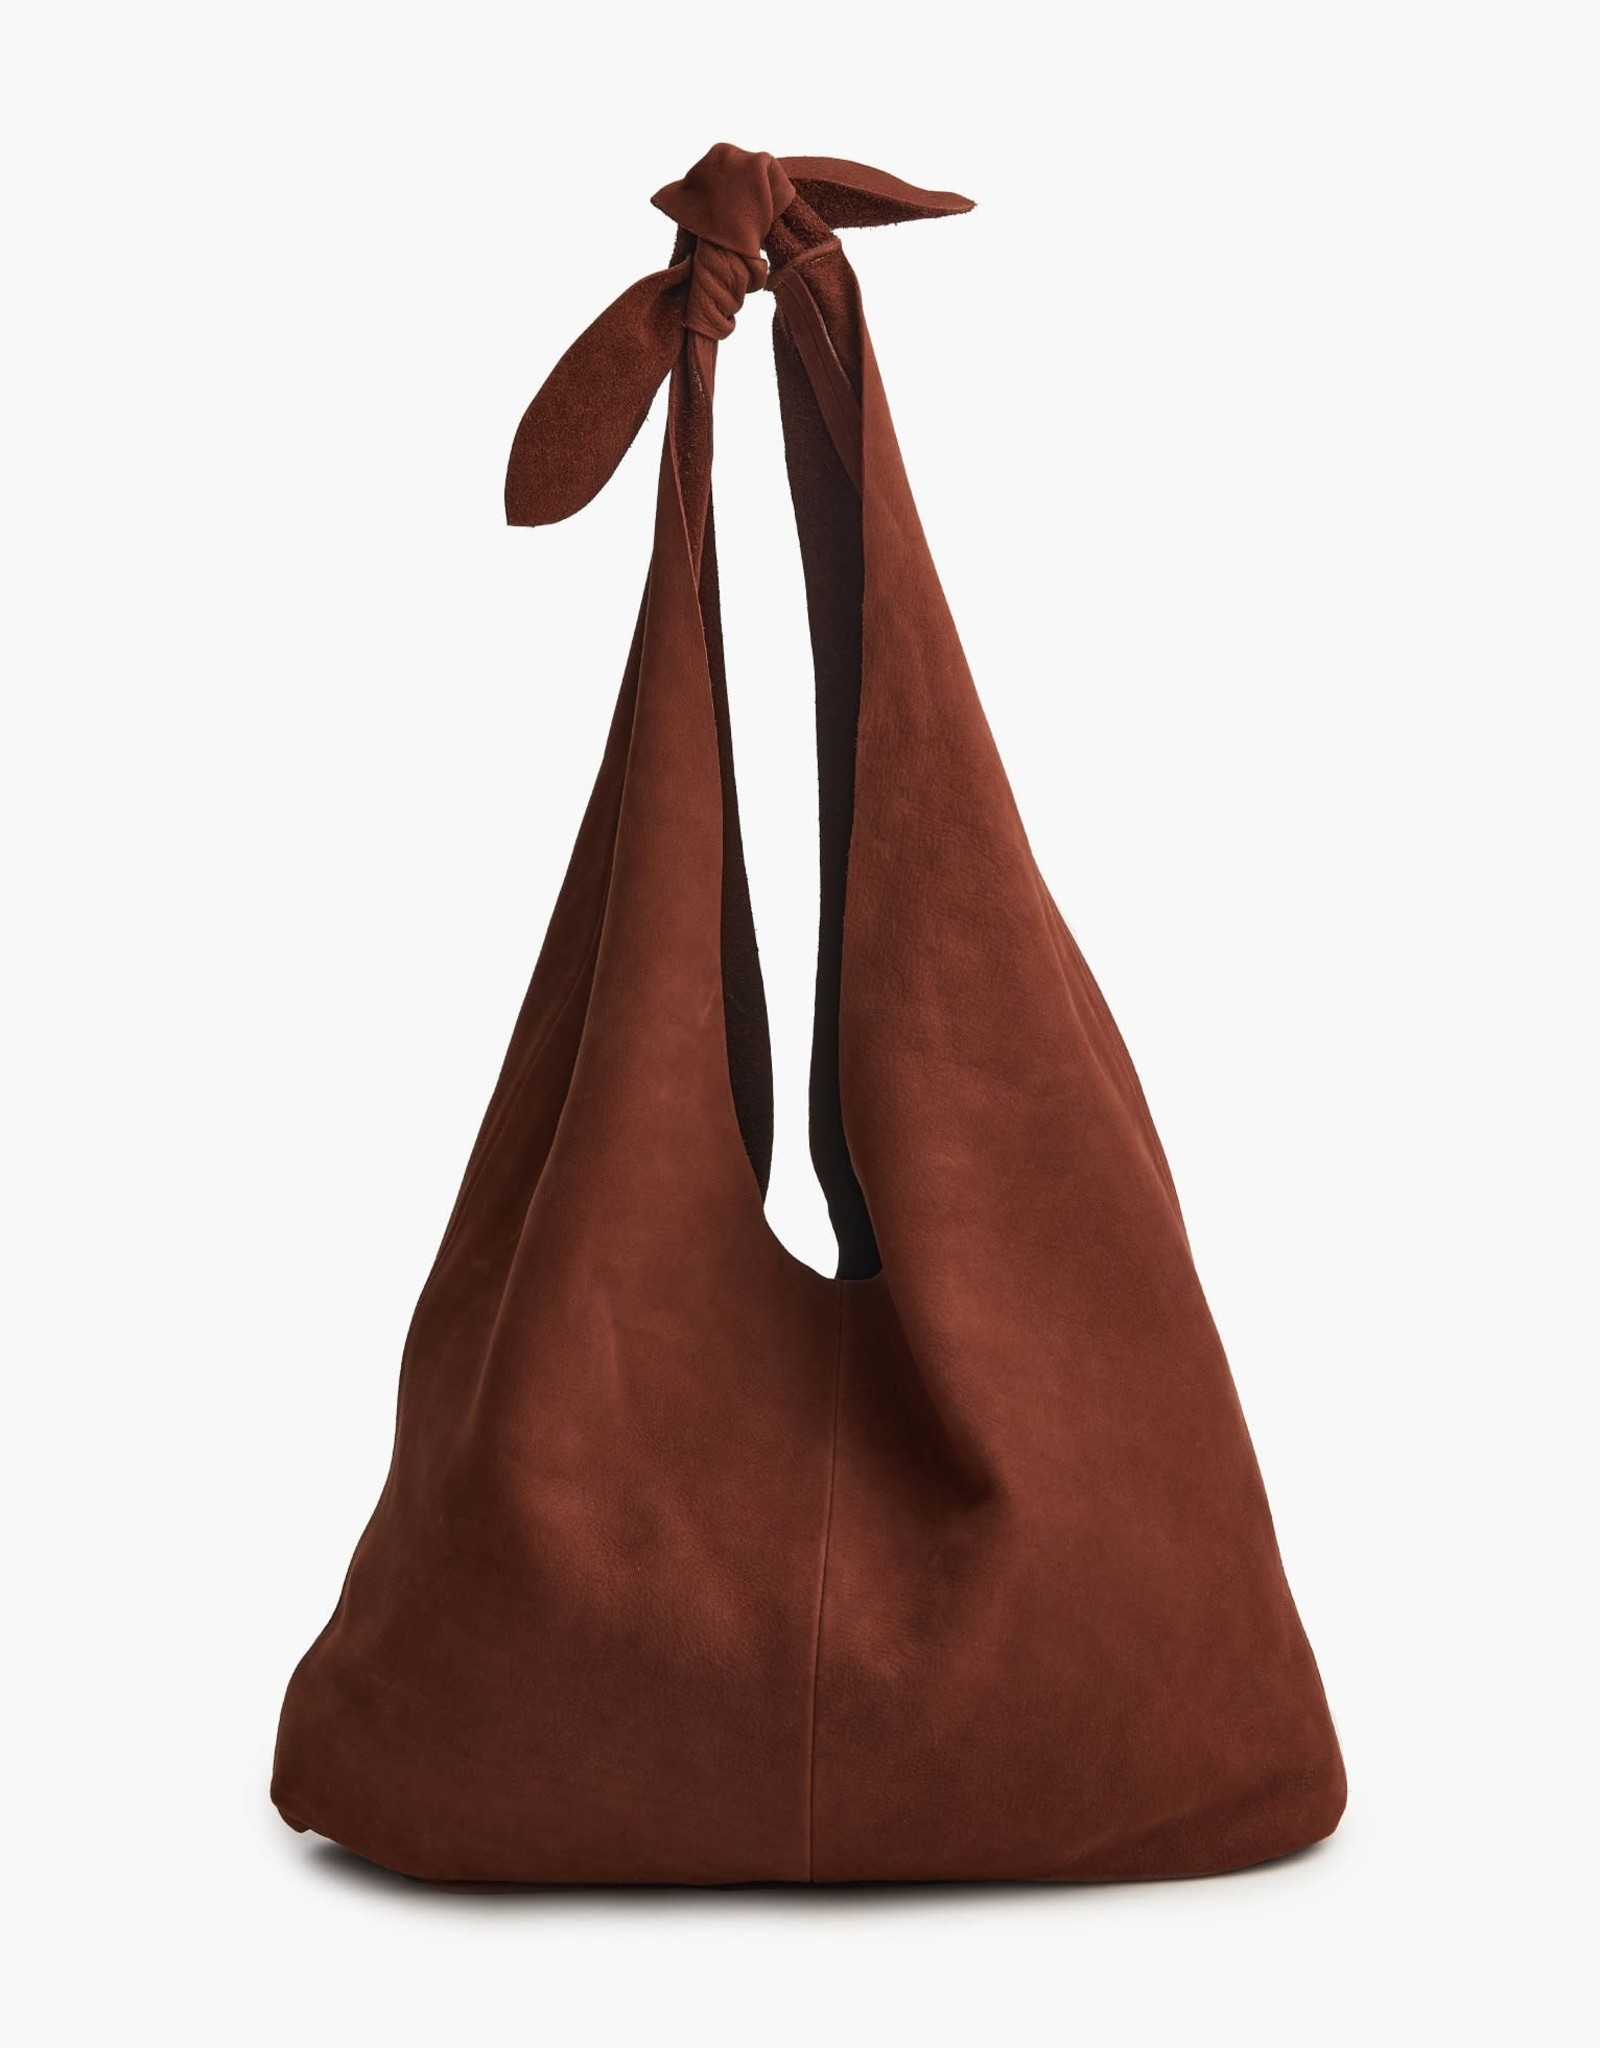 FashionABLE ABLE- Florencia Shoulder Bag (Whiskey)